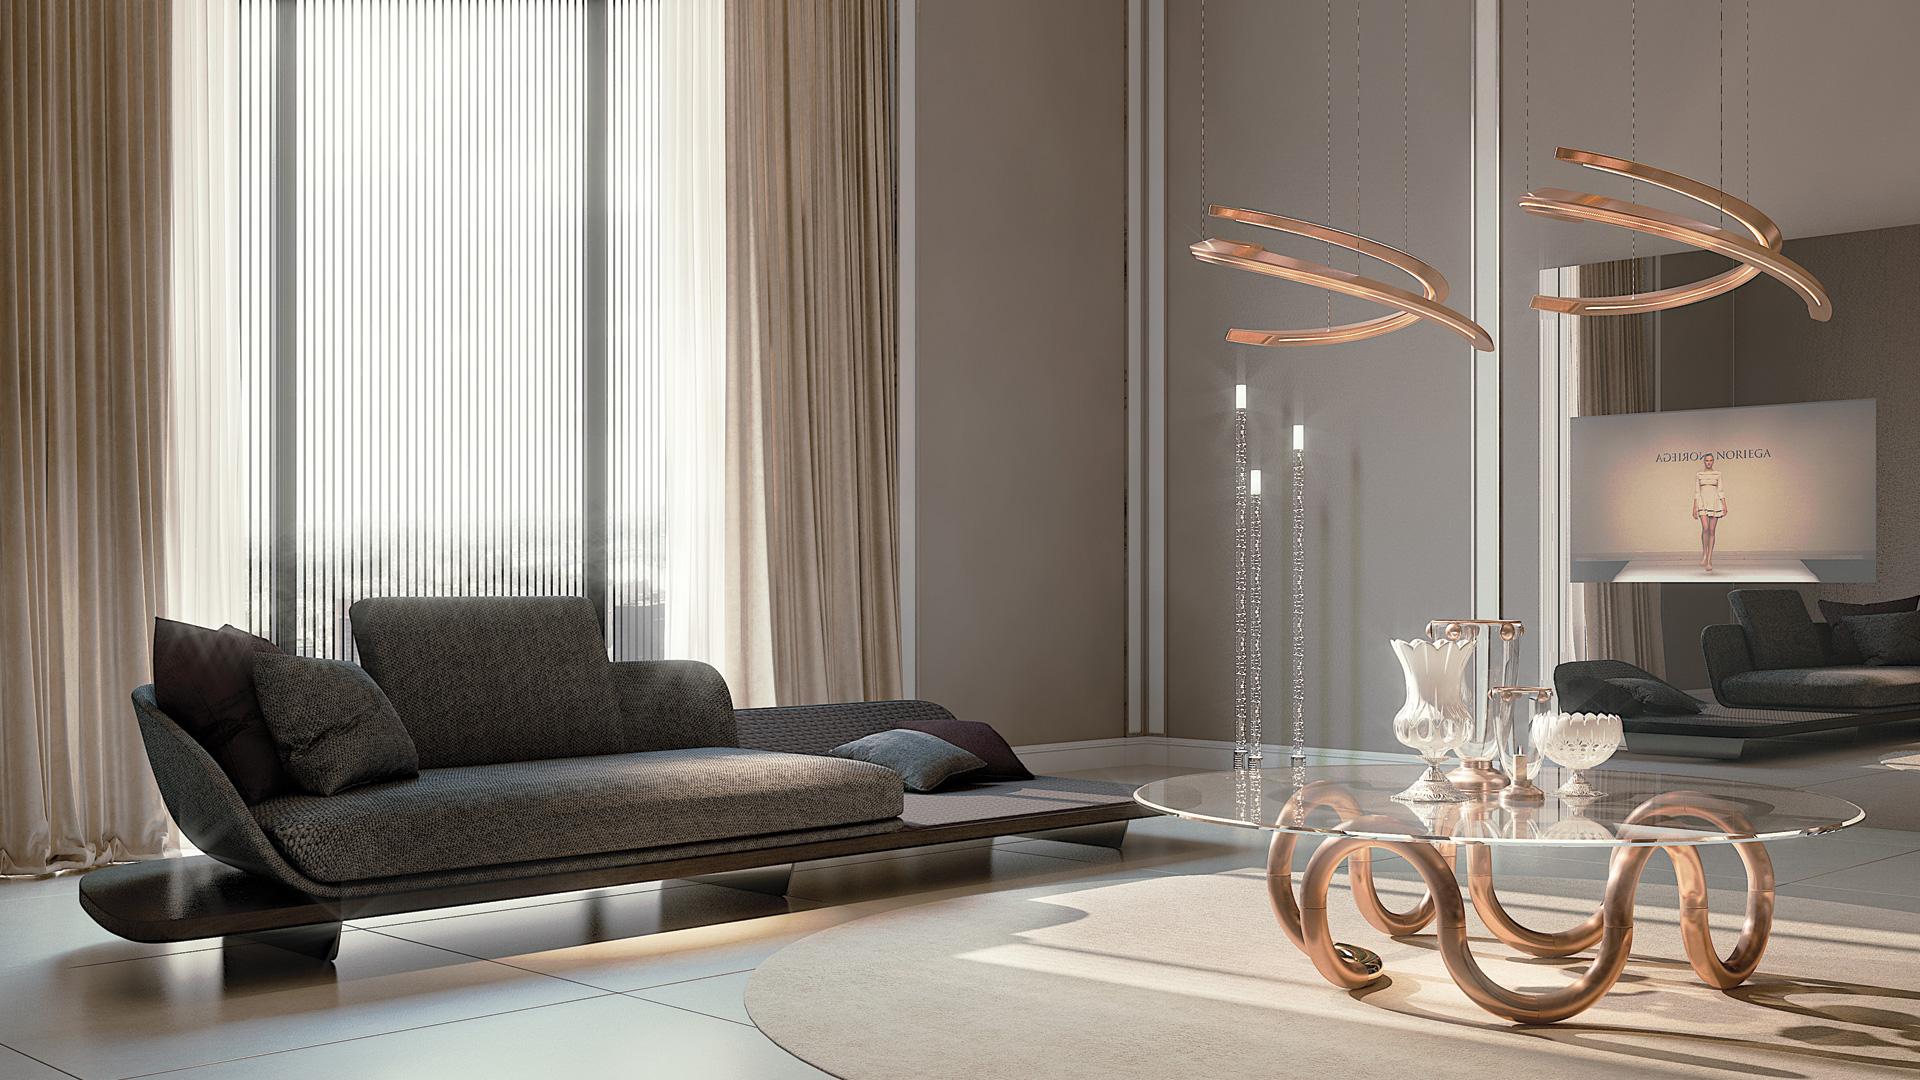 High End Italian Segno Chaise Lounge Italian Designer